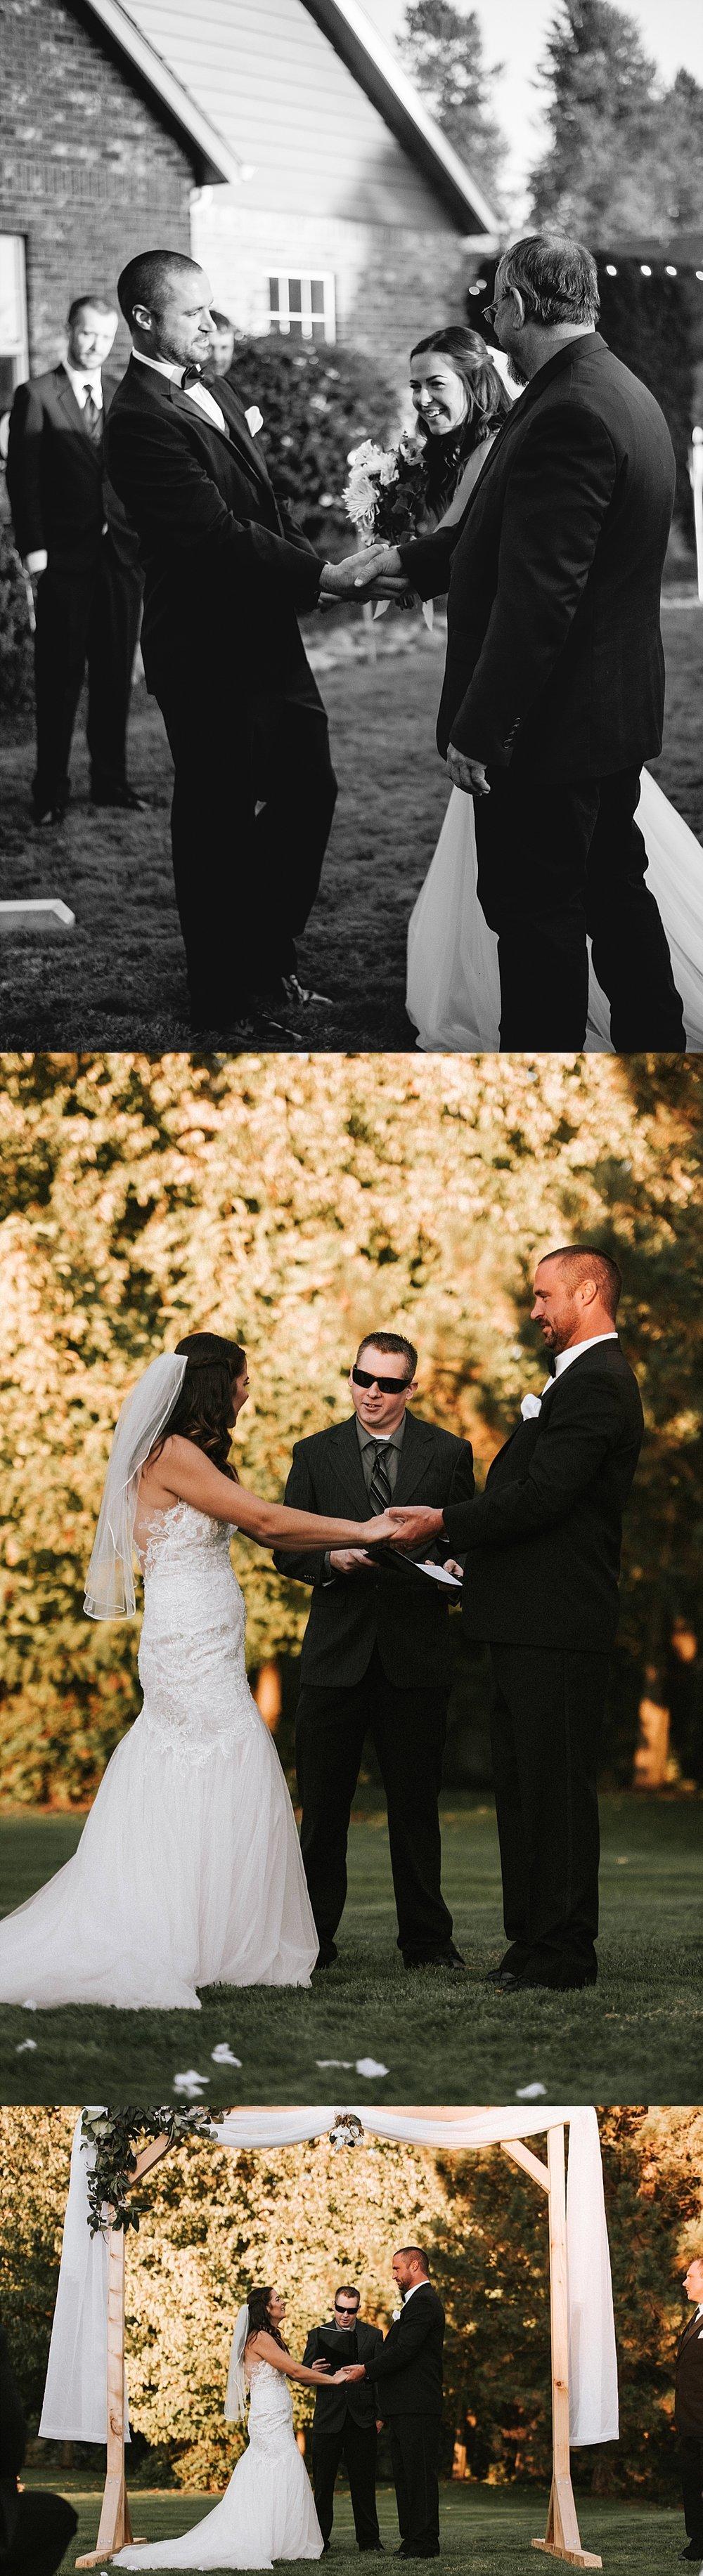 romantic backyard wedding_0046.jpg